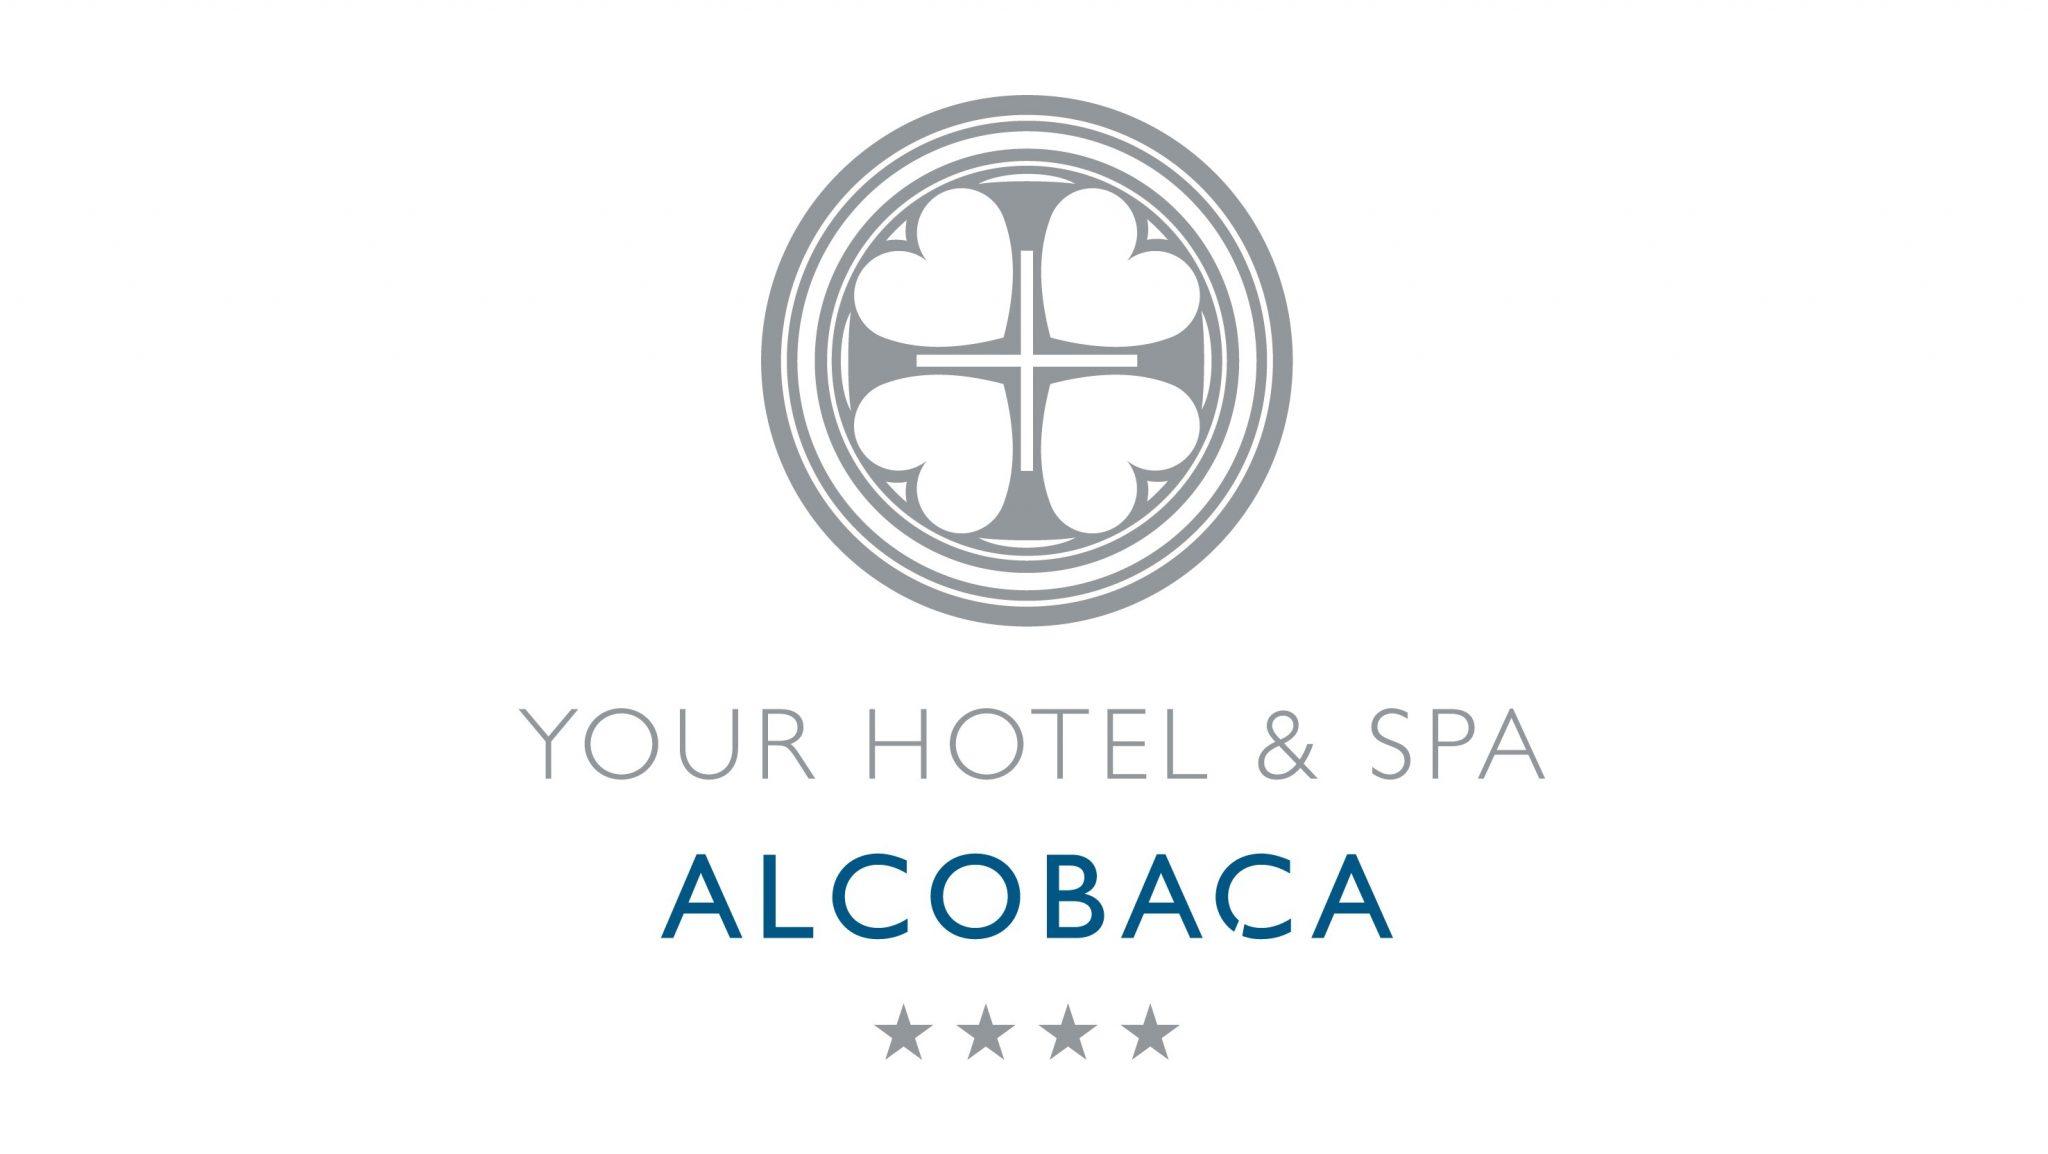 Your Hotel & Spa Alcobaça